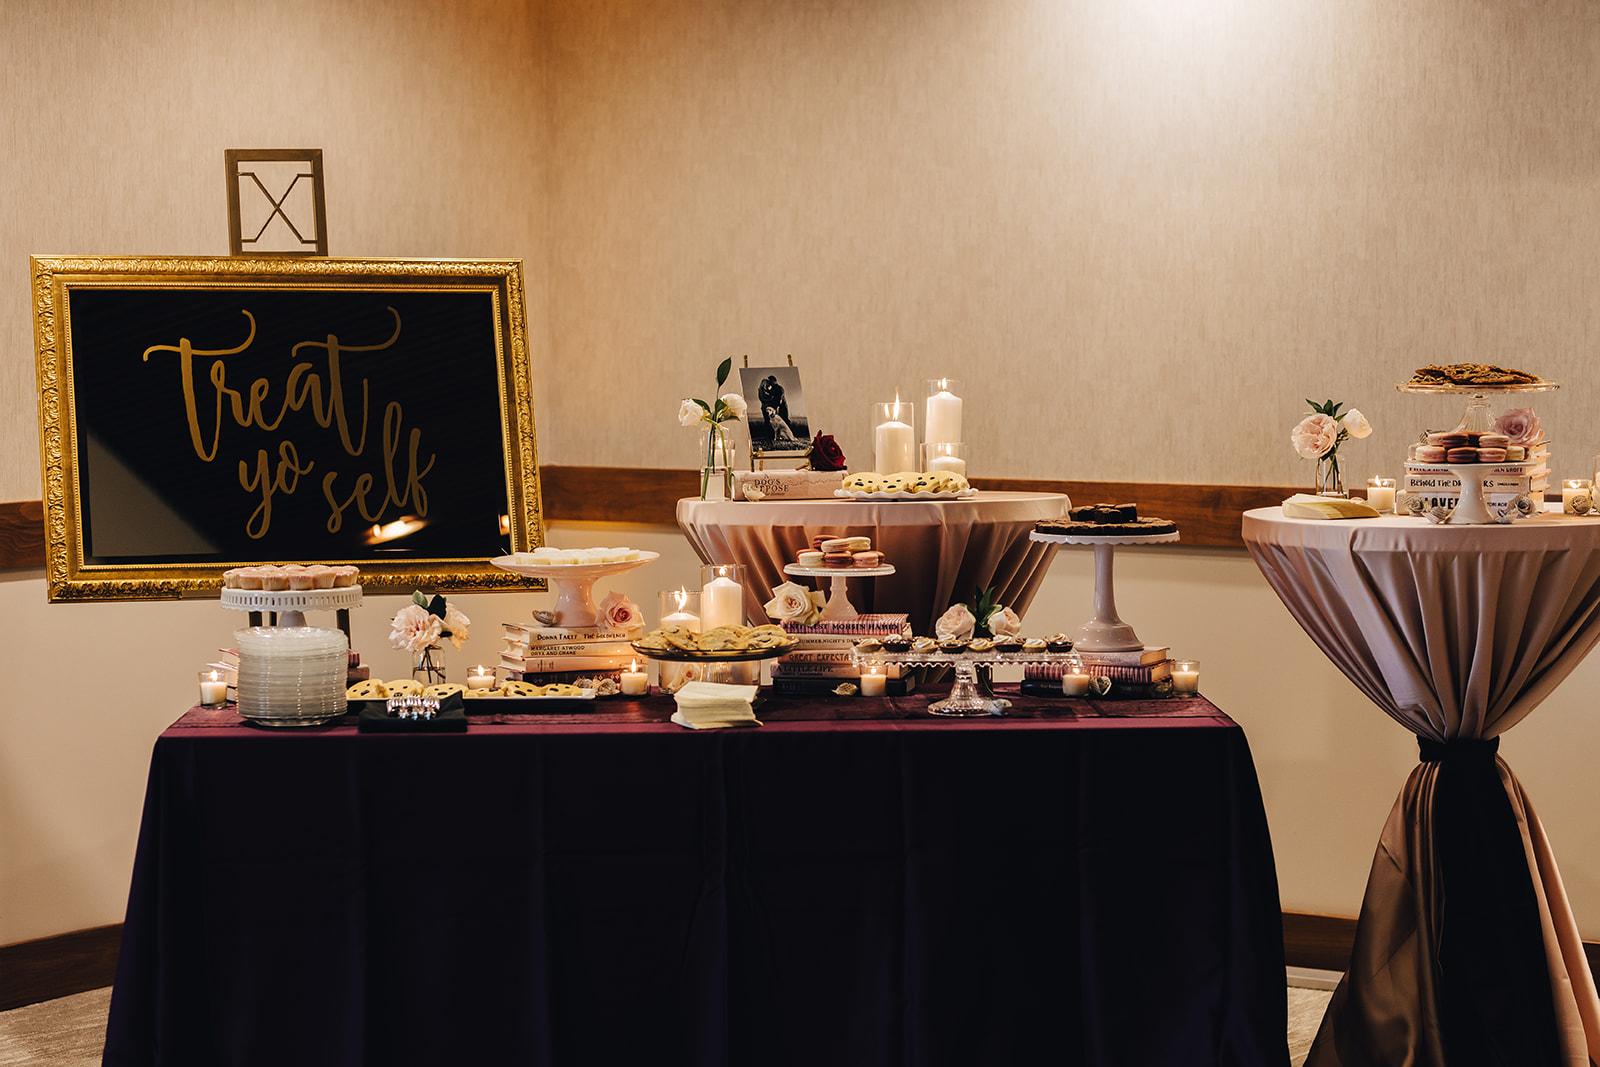 Treat yo self sign and dessert table